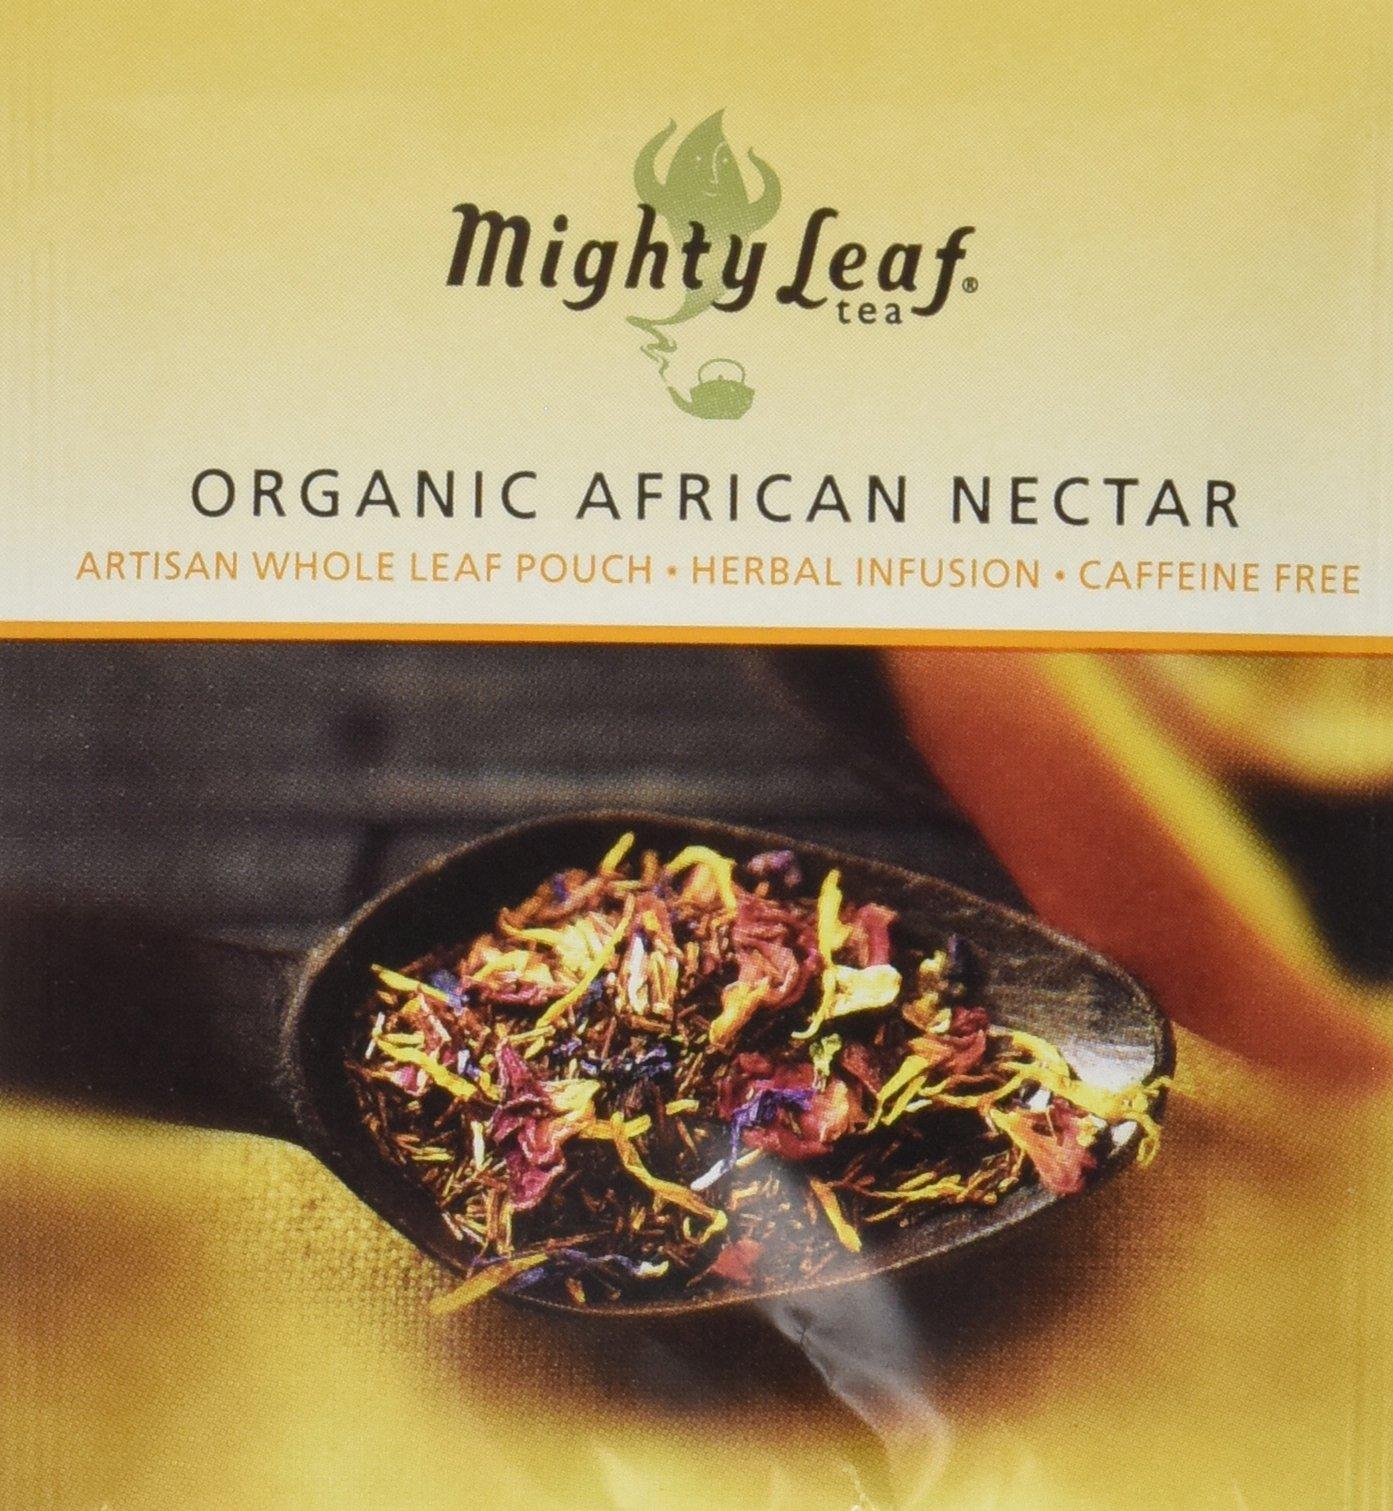 Mighty Leaf Organic African Nectar Tea, 100 Tea Pouches by Mighty Leaf Tea